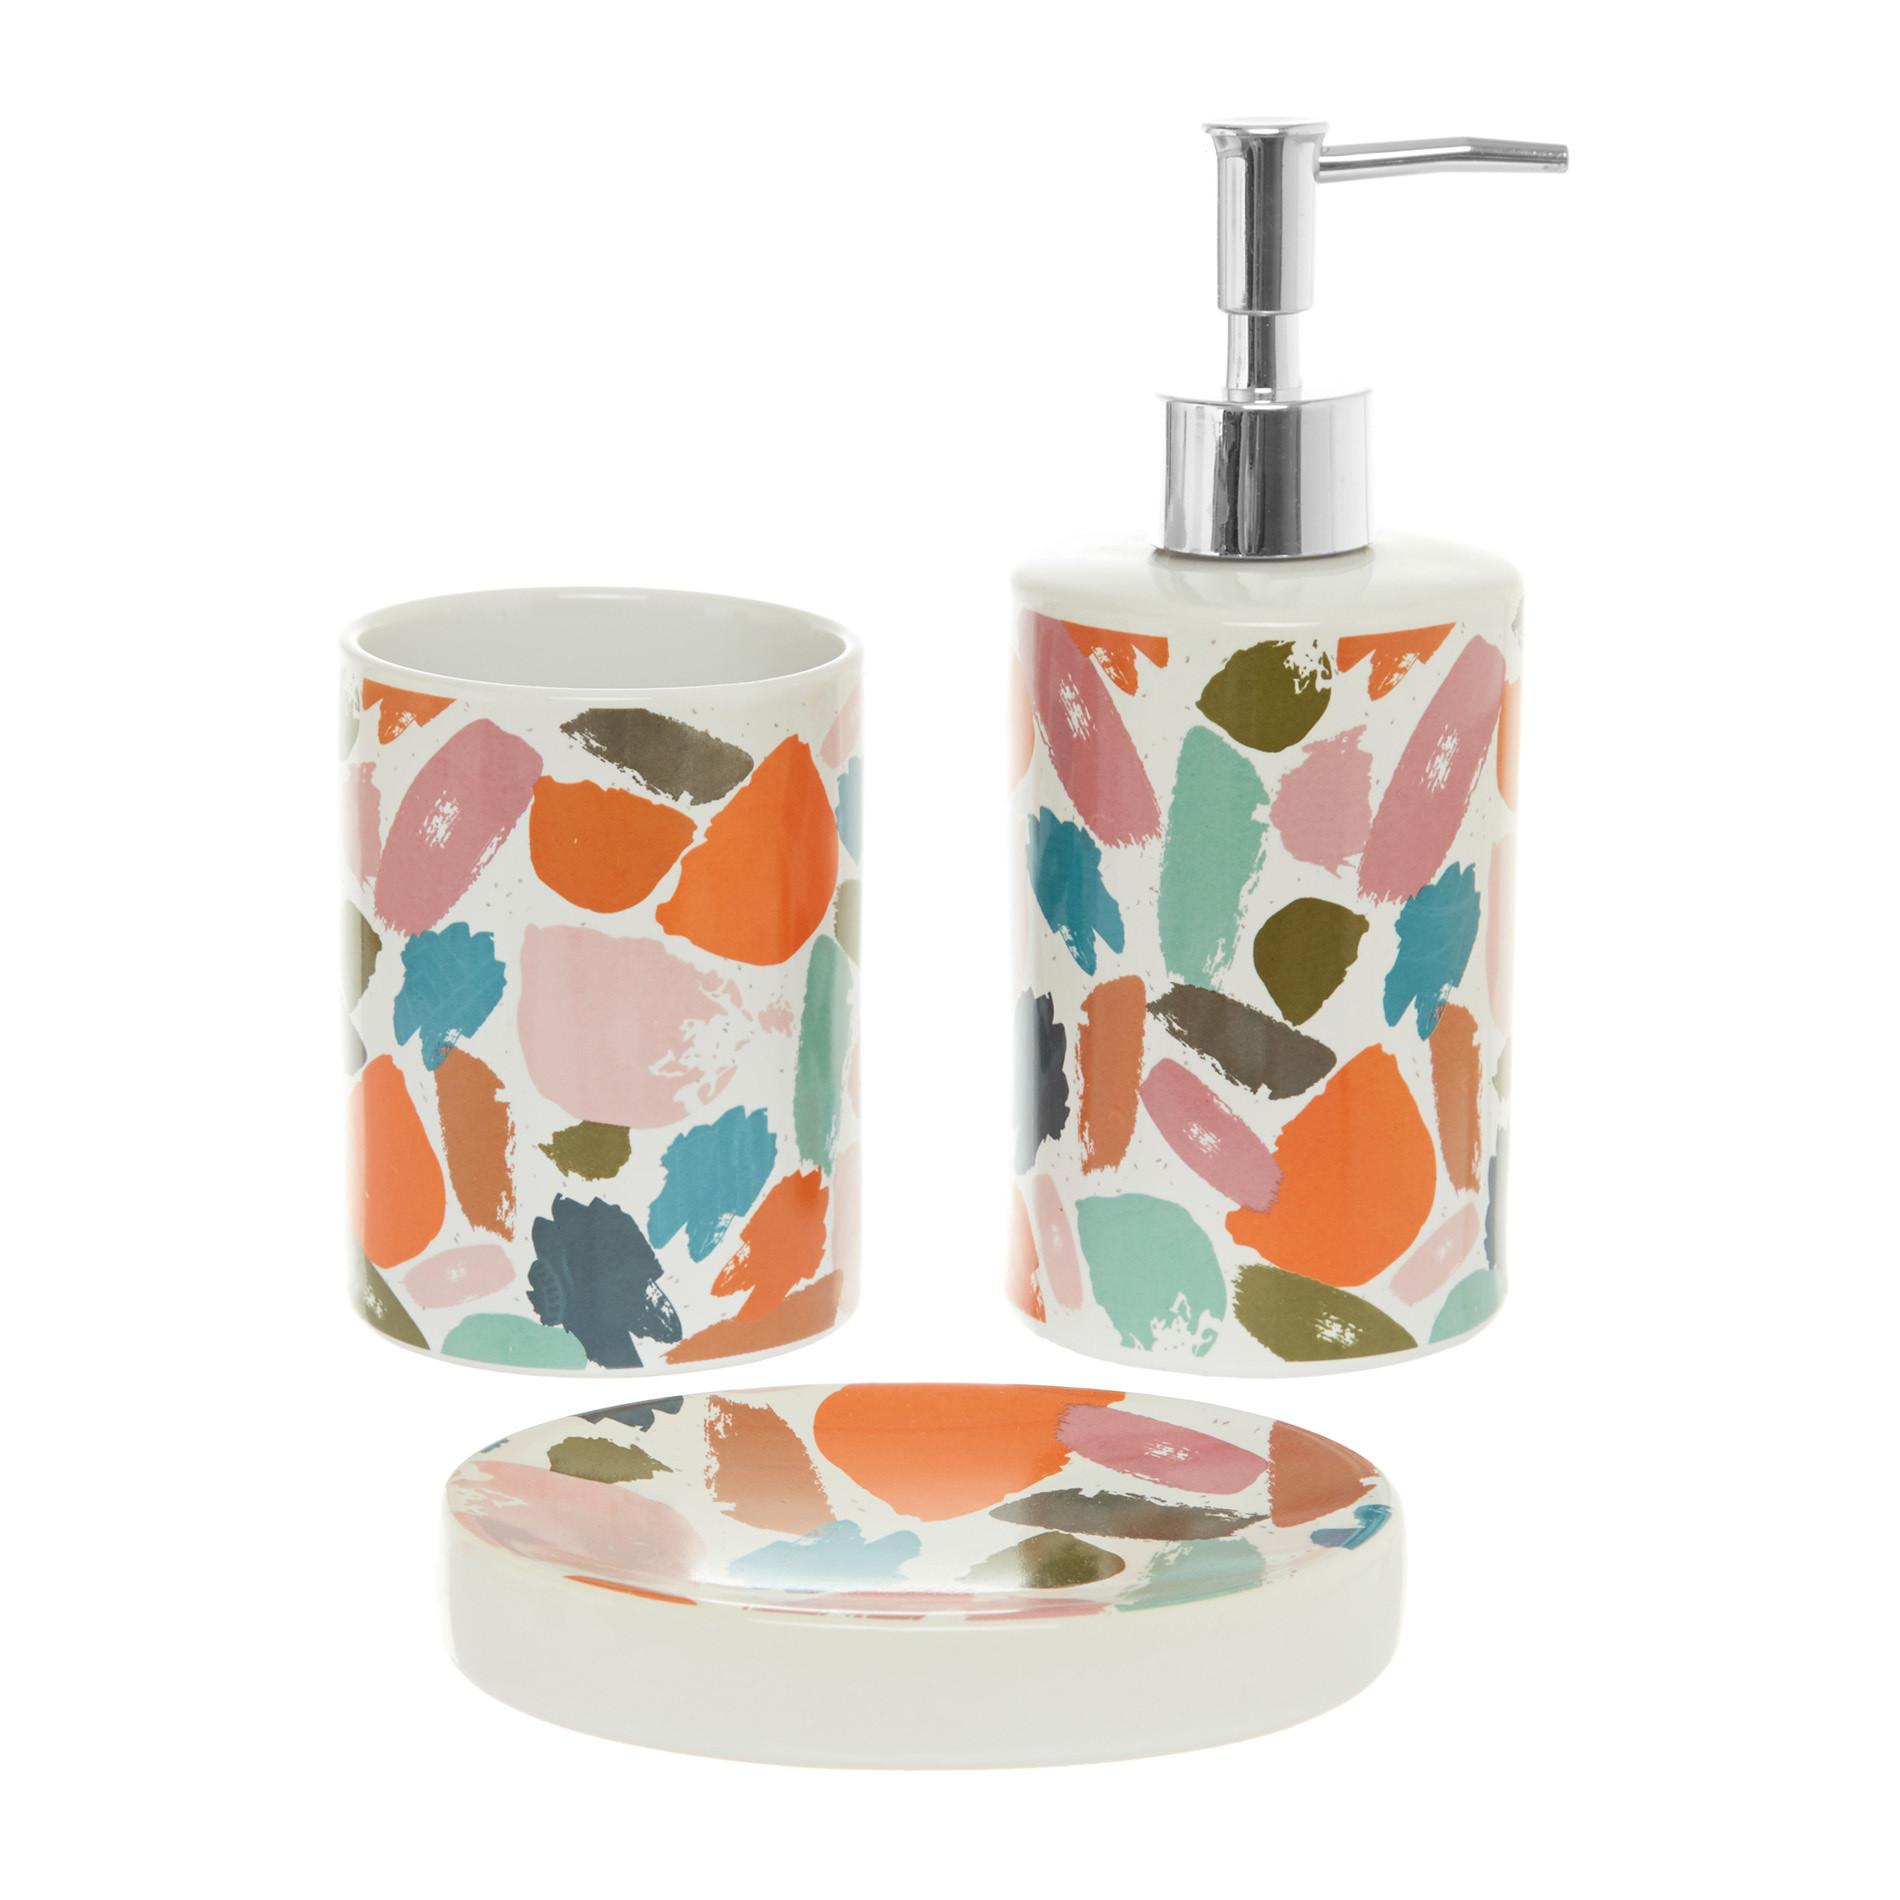 Set 3 accessori da bagno in ceramica motivo macchie, Multicolor, large image number 0